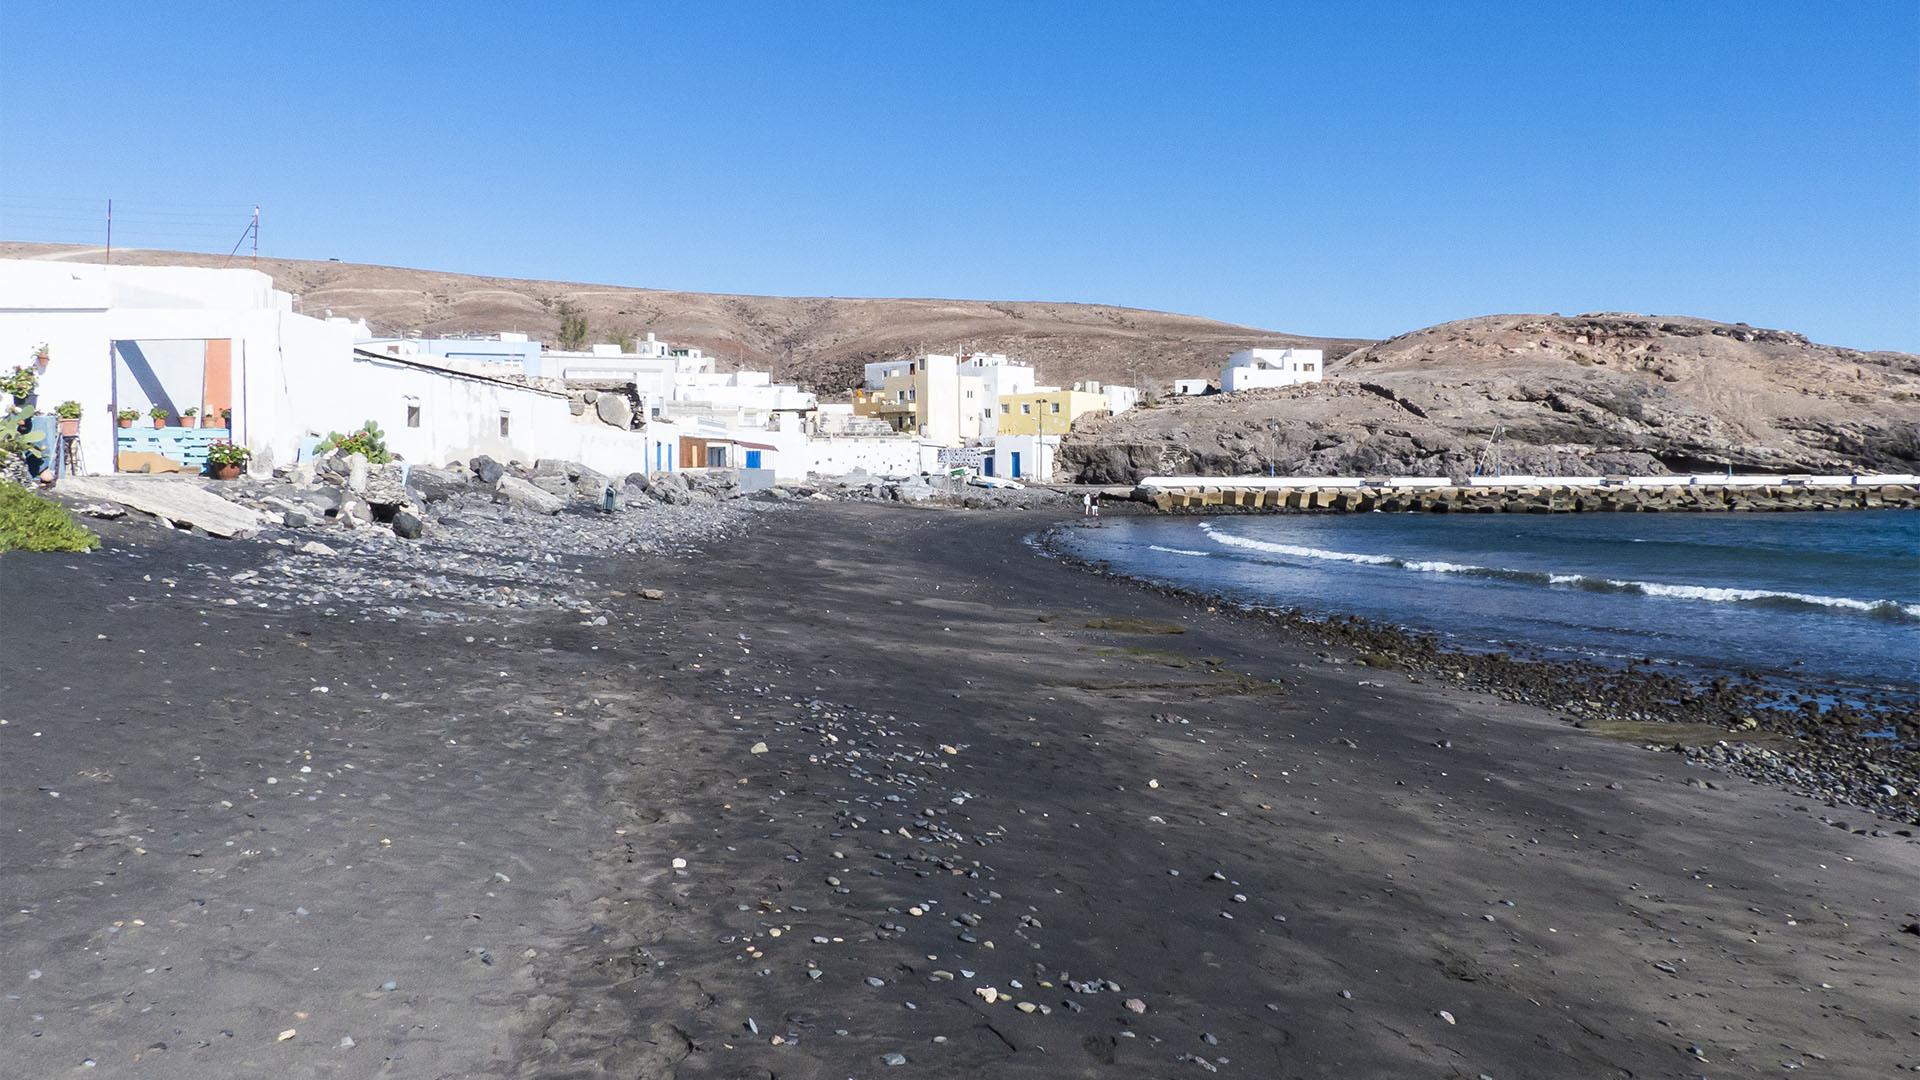 Die Strände Fuerteventuras: Playa de Tarajalejo.